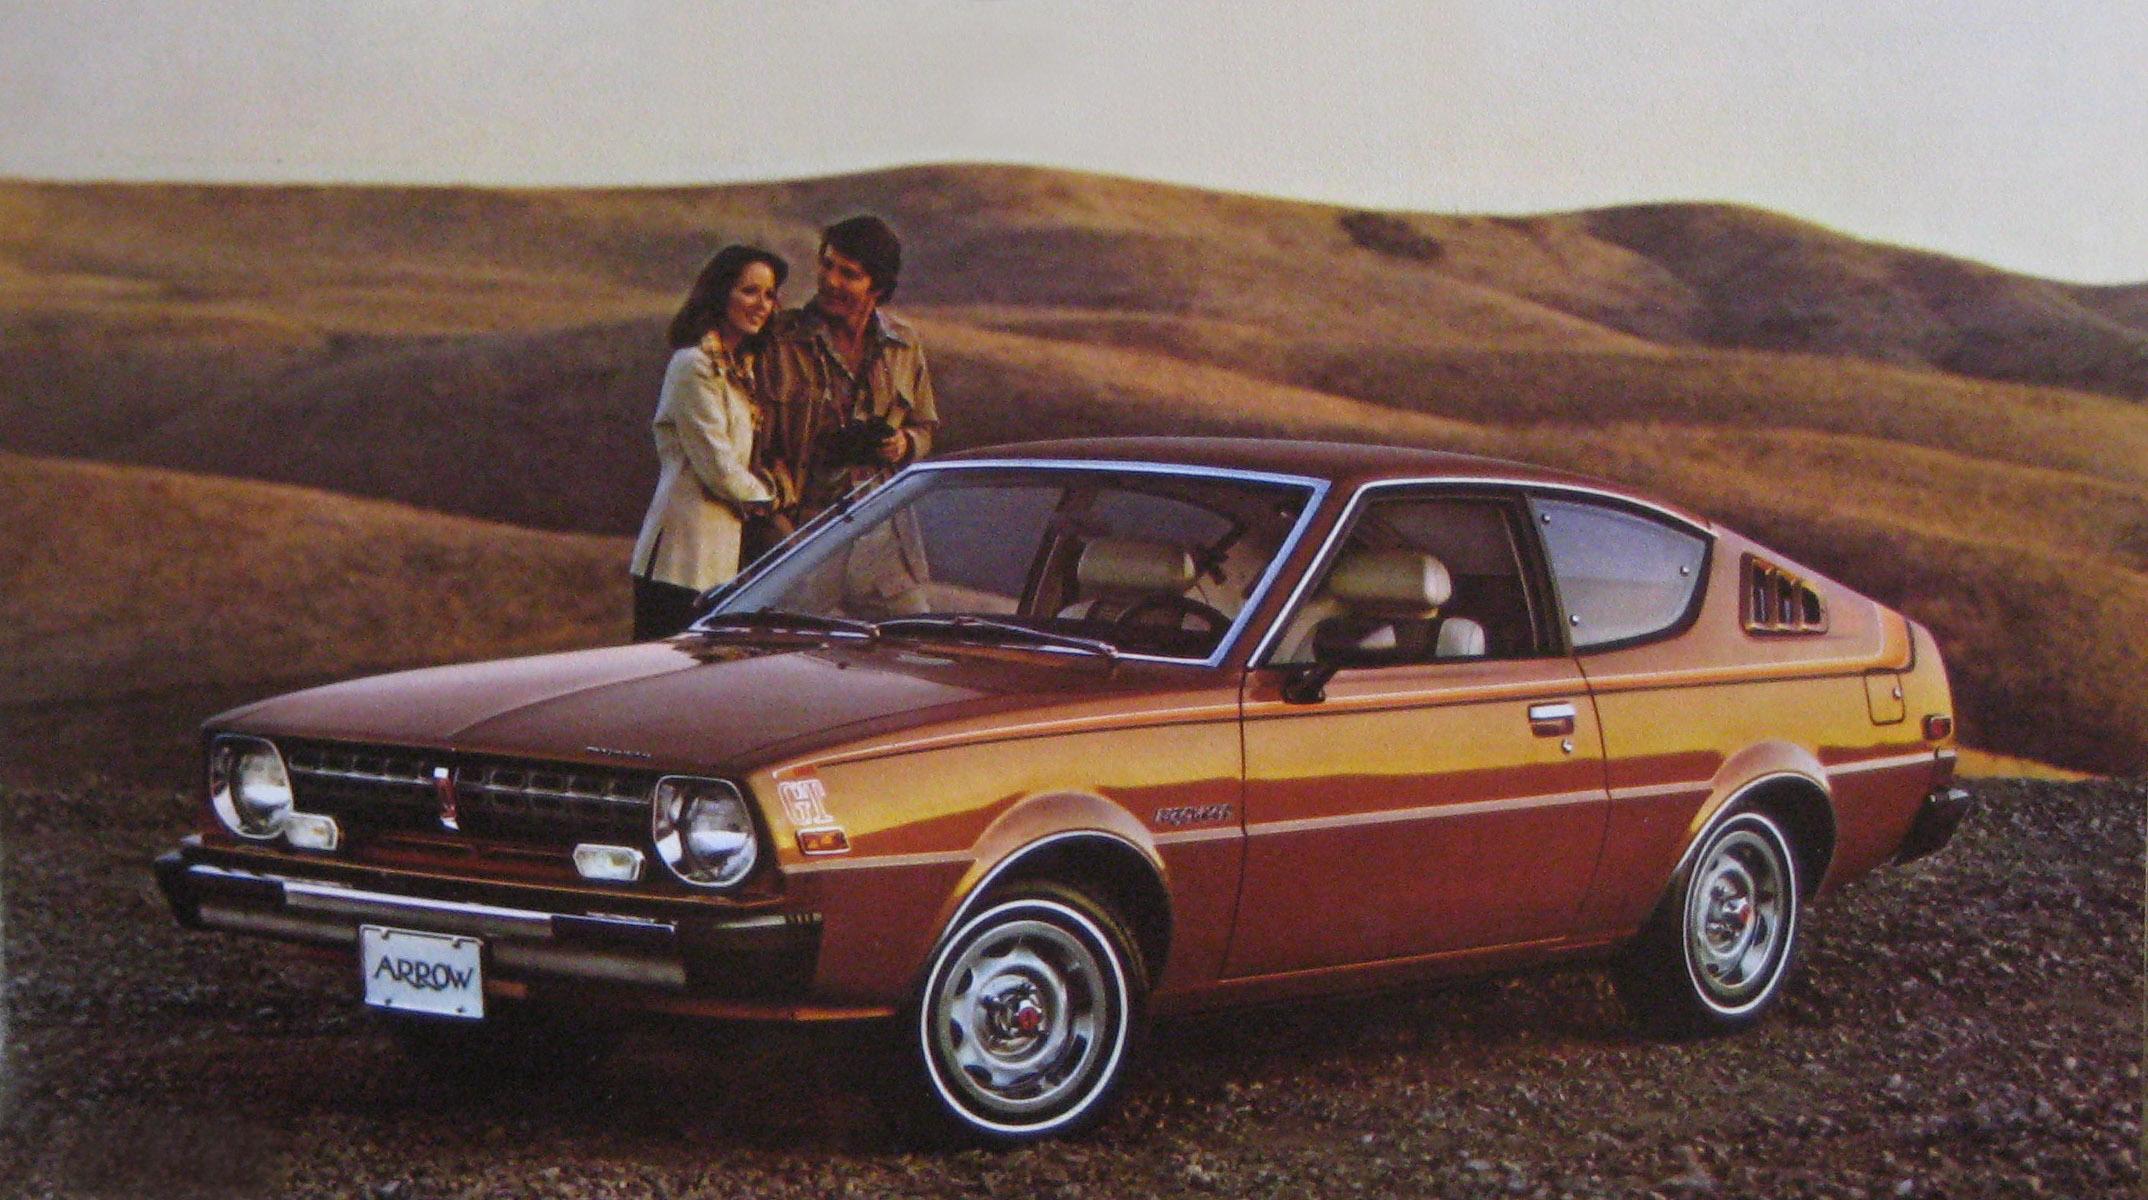 1976 Plymouth Arrow.